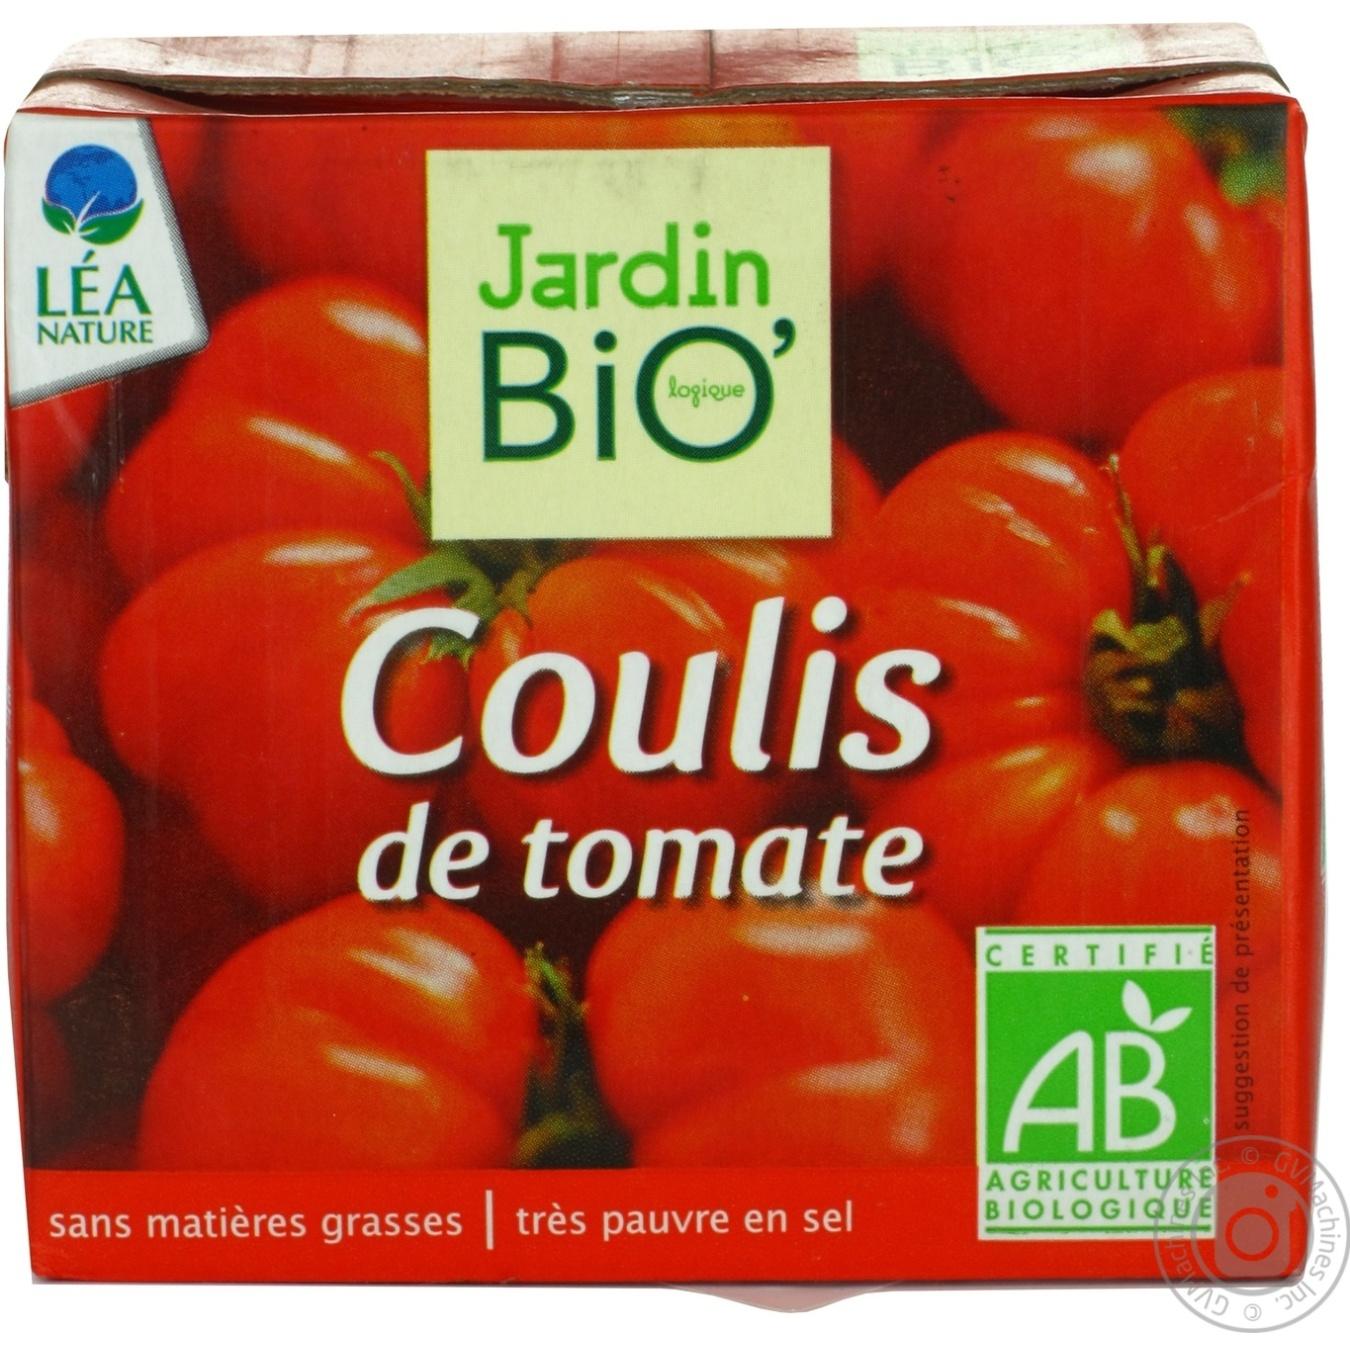 sauce jardin bio tomato 500ml - Jardin Bio